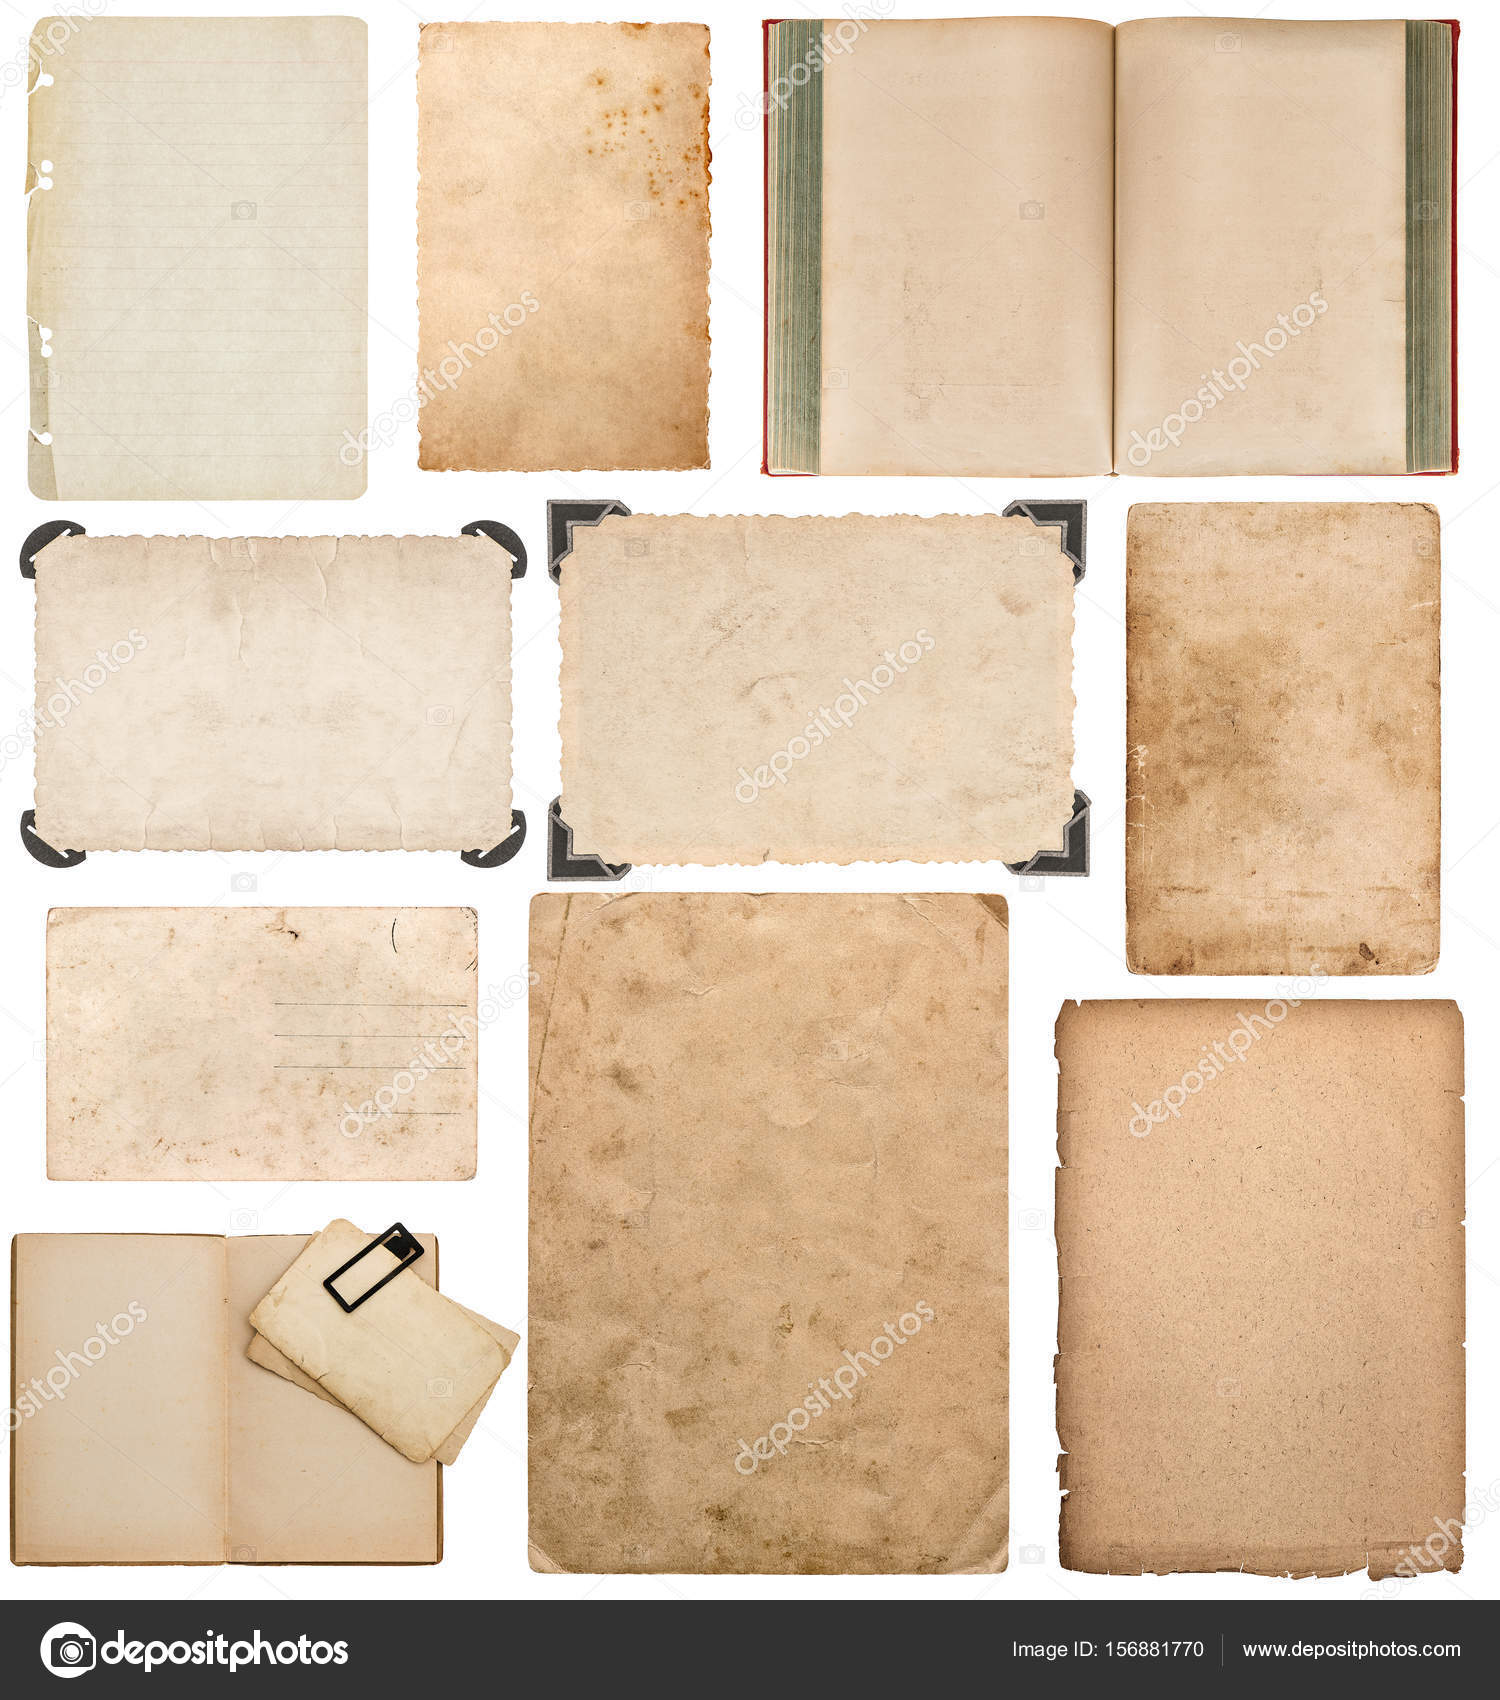 paper sheet book cardboard photo frame corner scrapbook stock